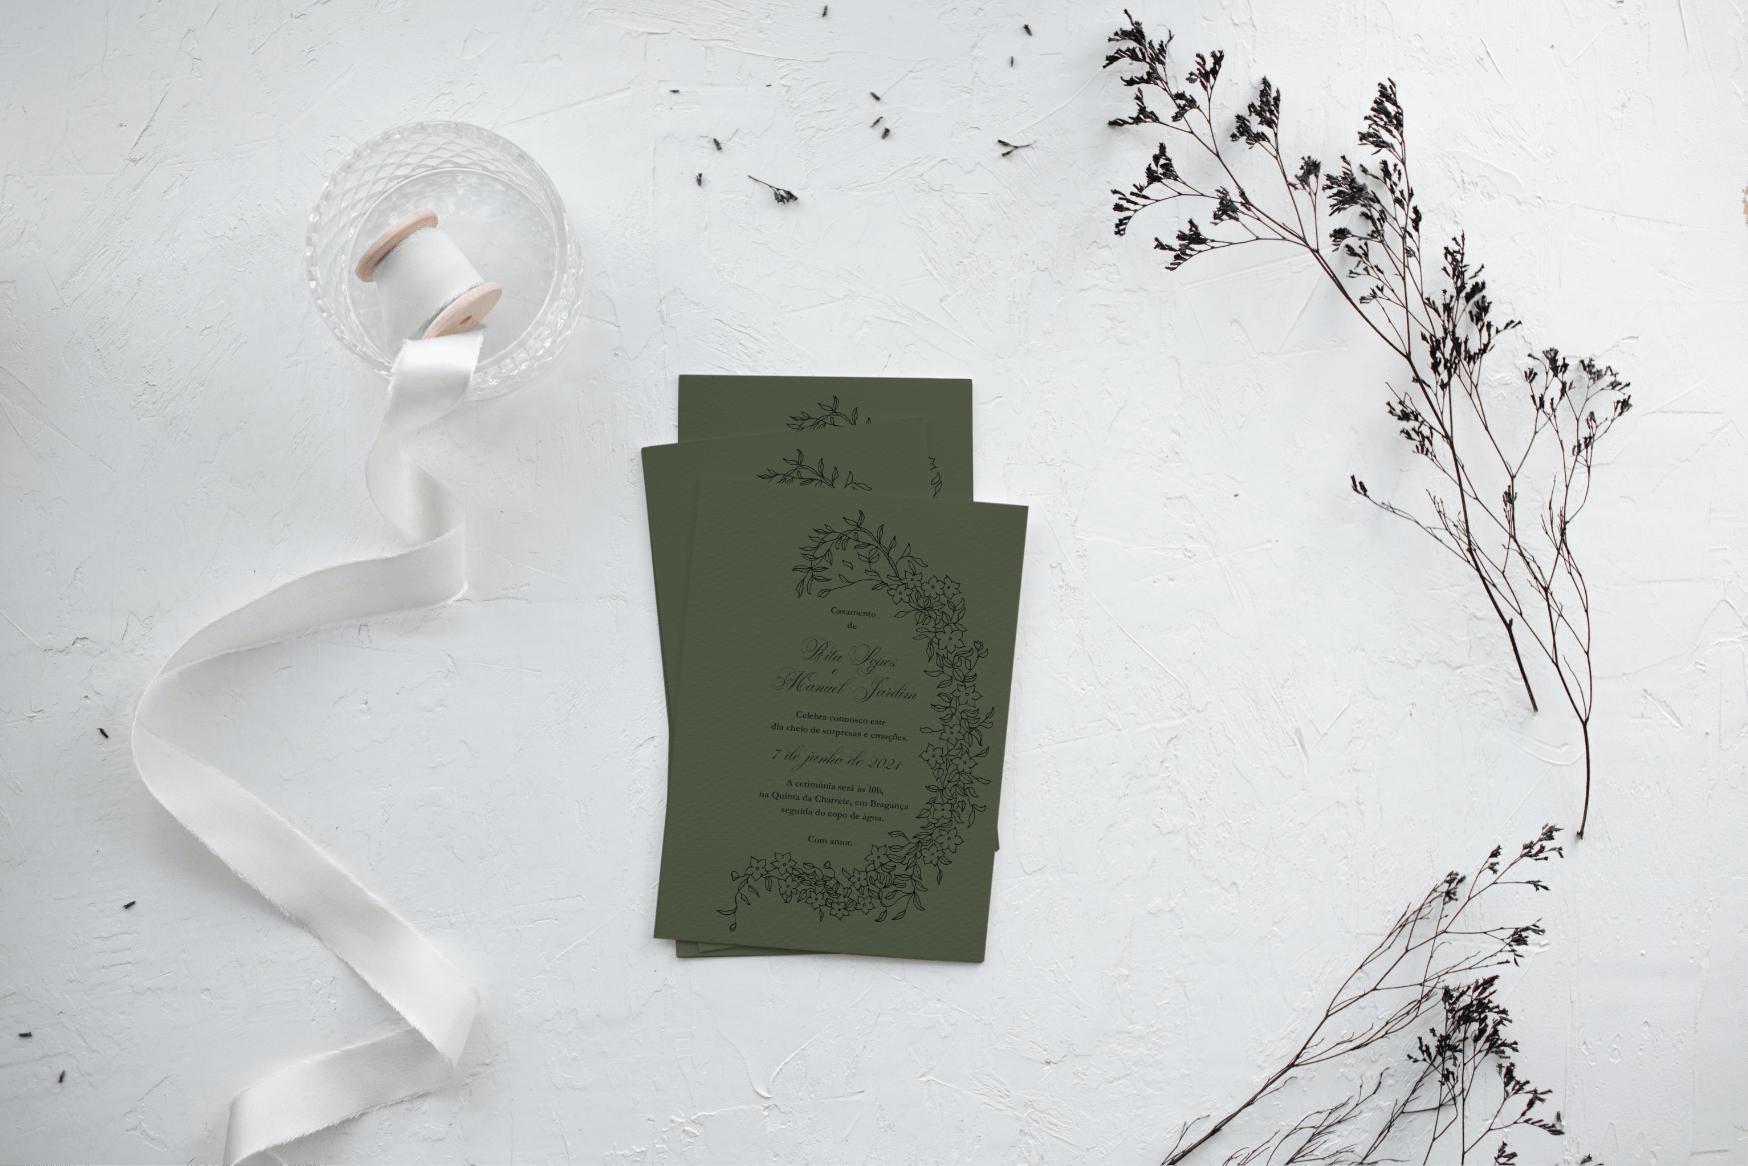 Convite de casamento verde de estilo floral com tipografia preta